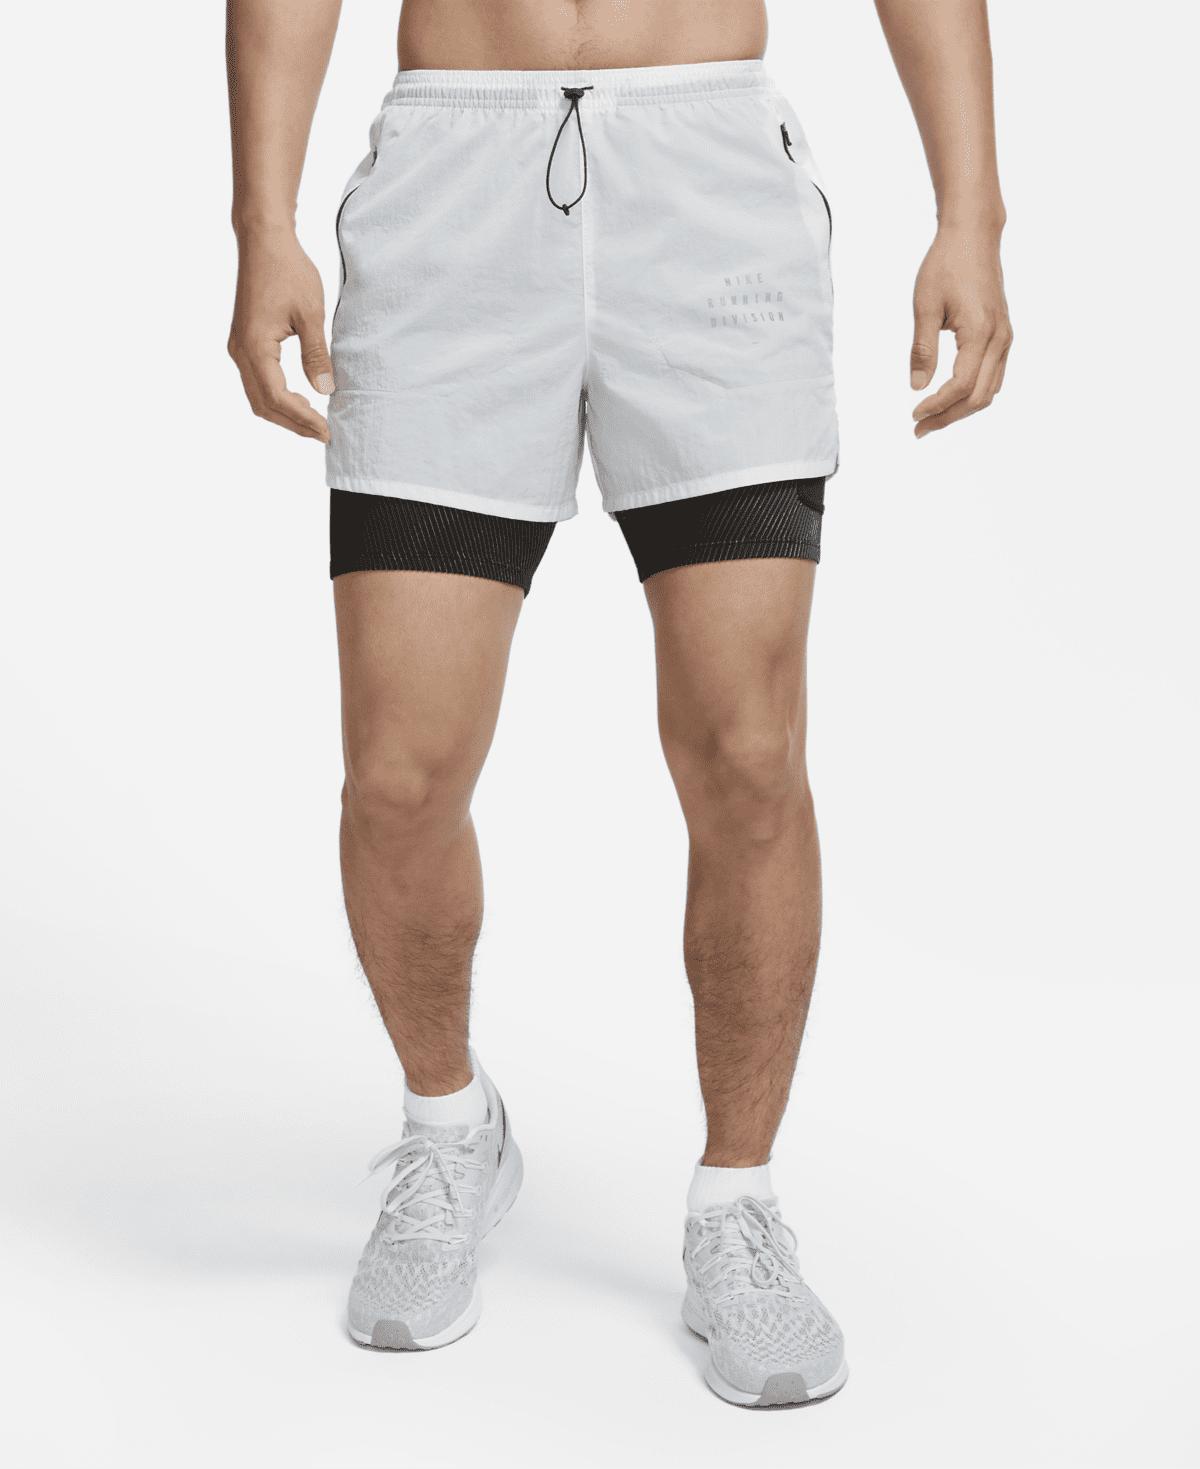 Infectar Escrupuloso Explícito  Nike plus +: Member Exclusive: Run Division | Milled